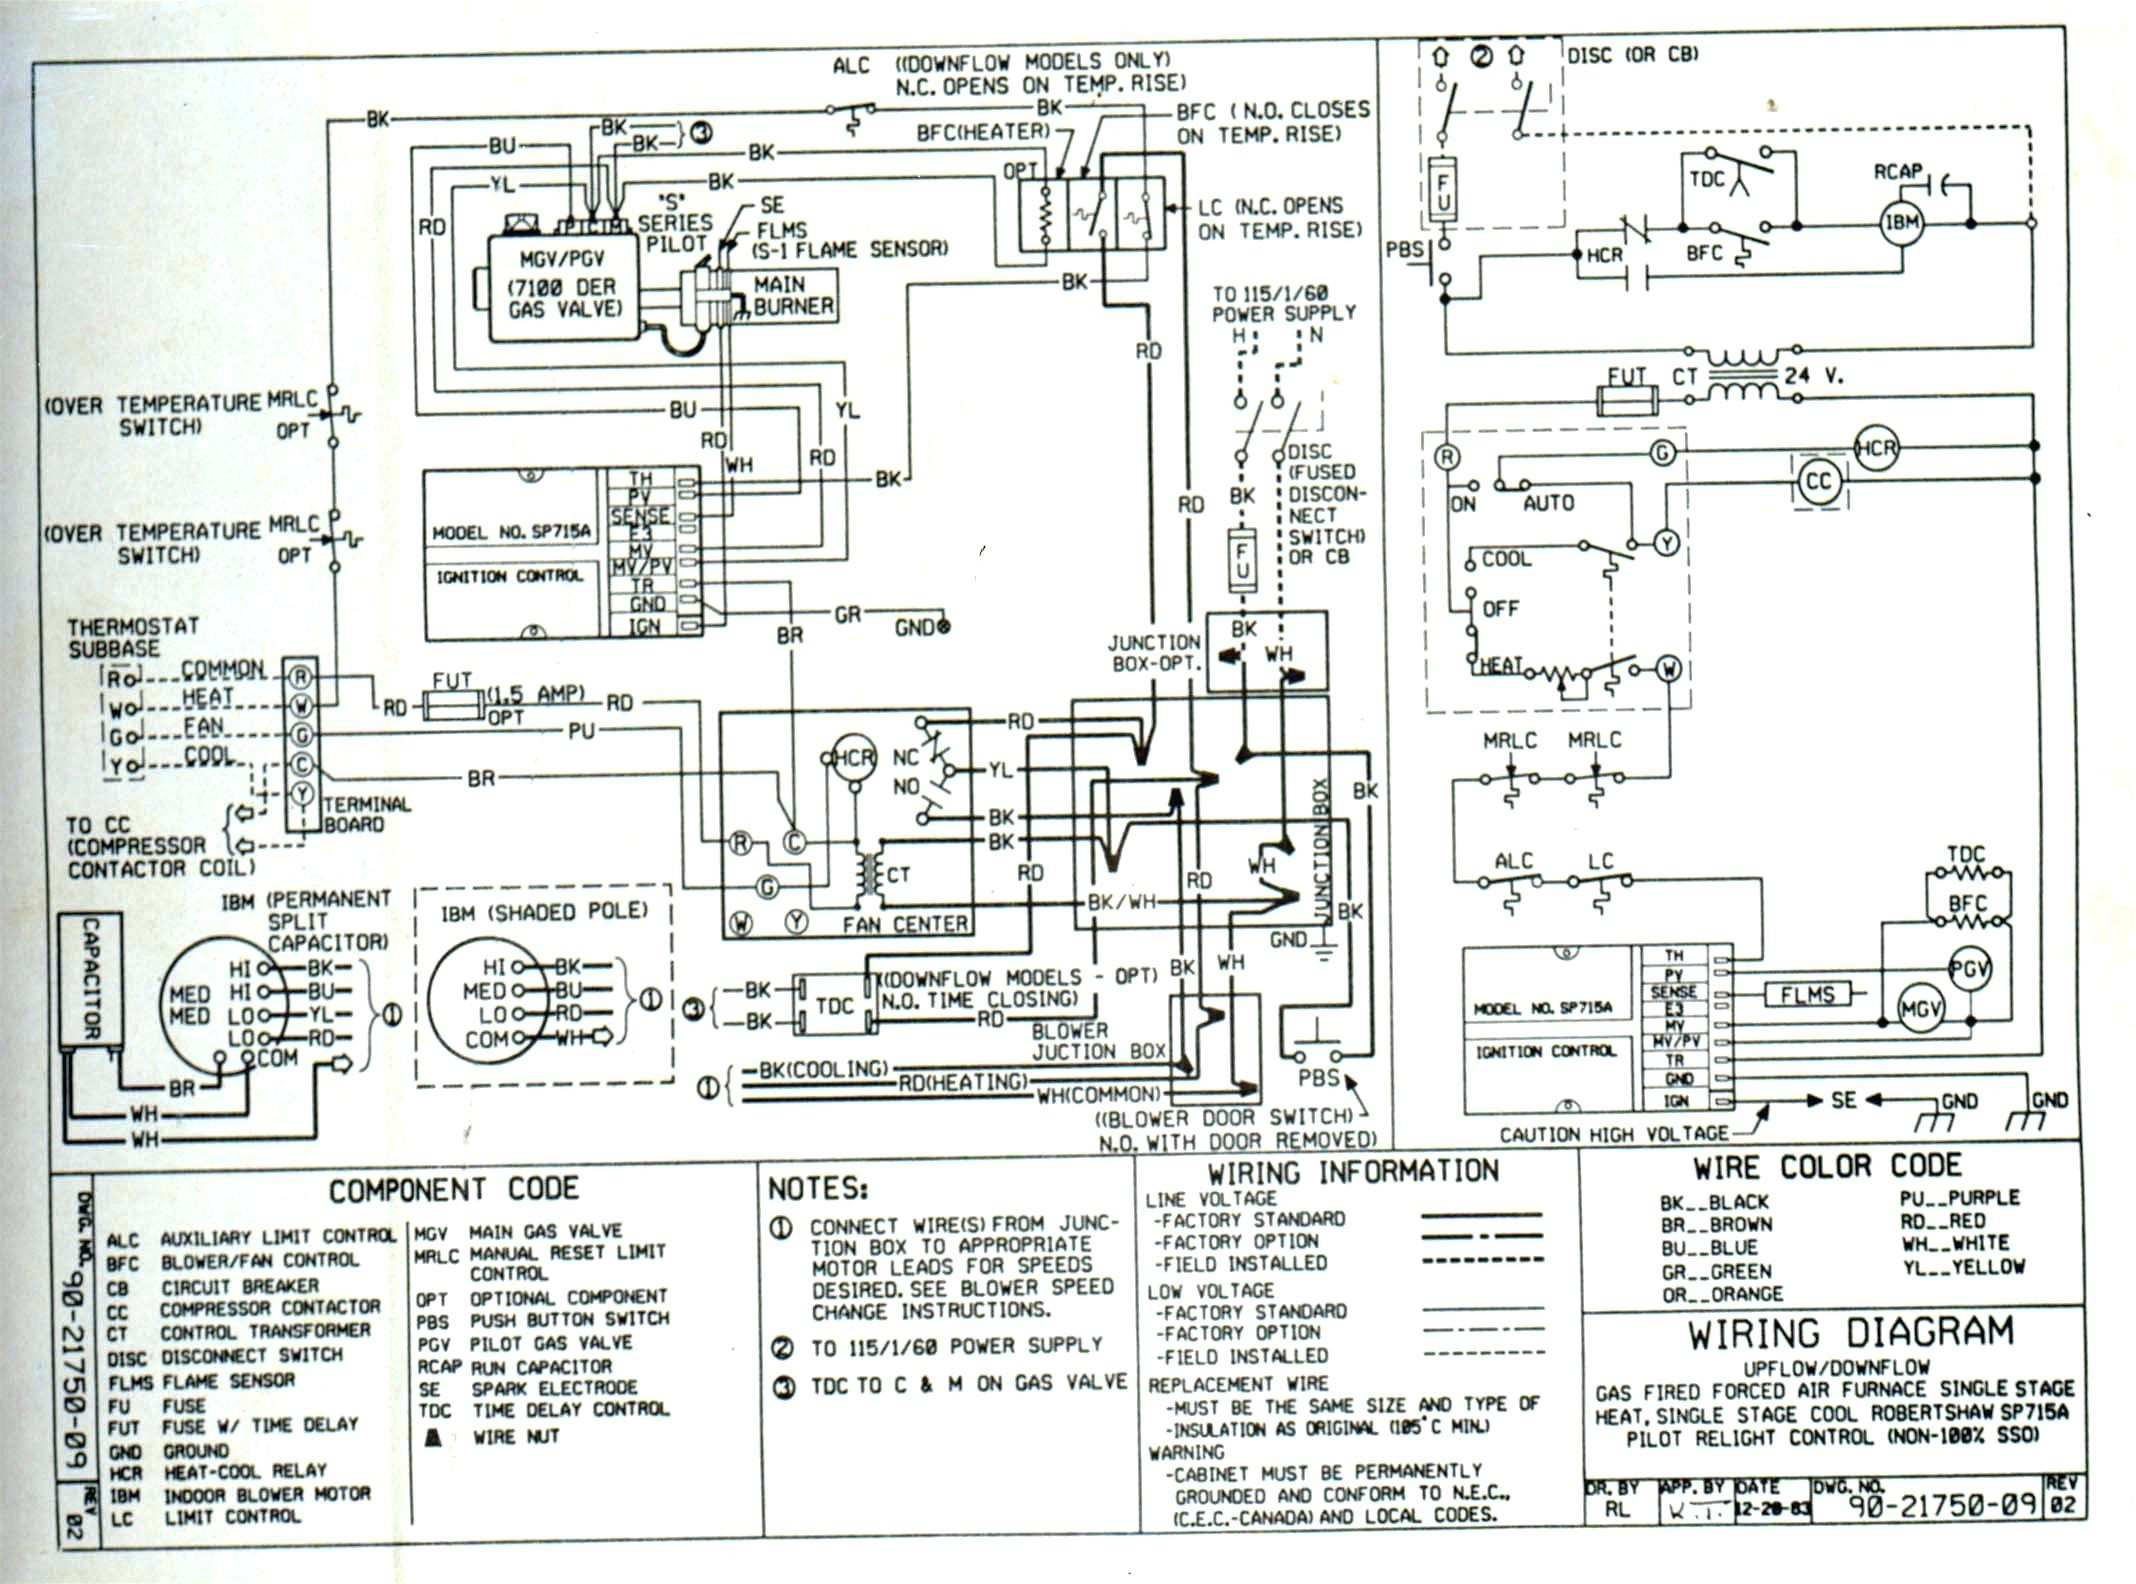 Understanding Hvac Wiring Diagrams Wiring Diagram for Trane Air Conditioner New Diagram Hvac Wiring Of Understanding Hvac Wiring Diagrams